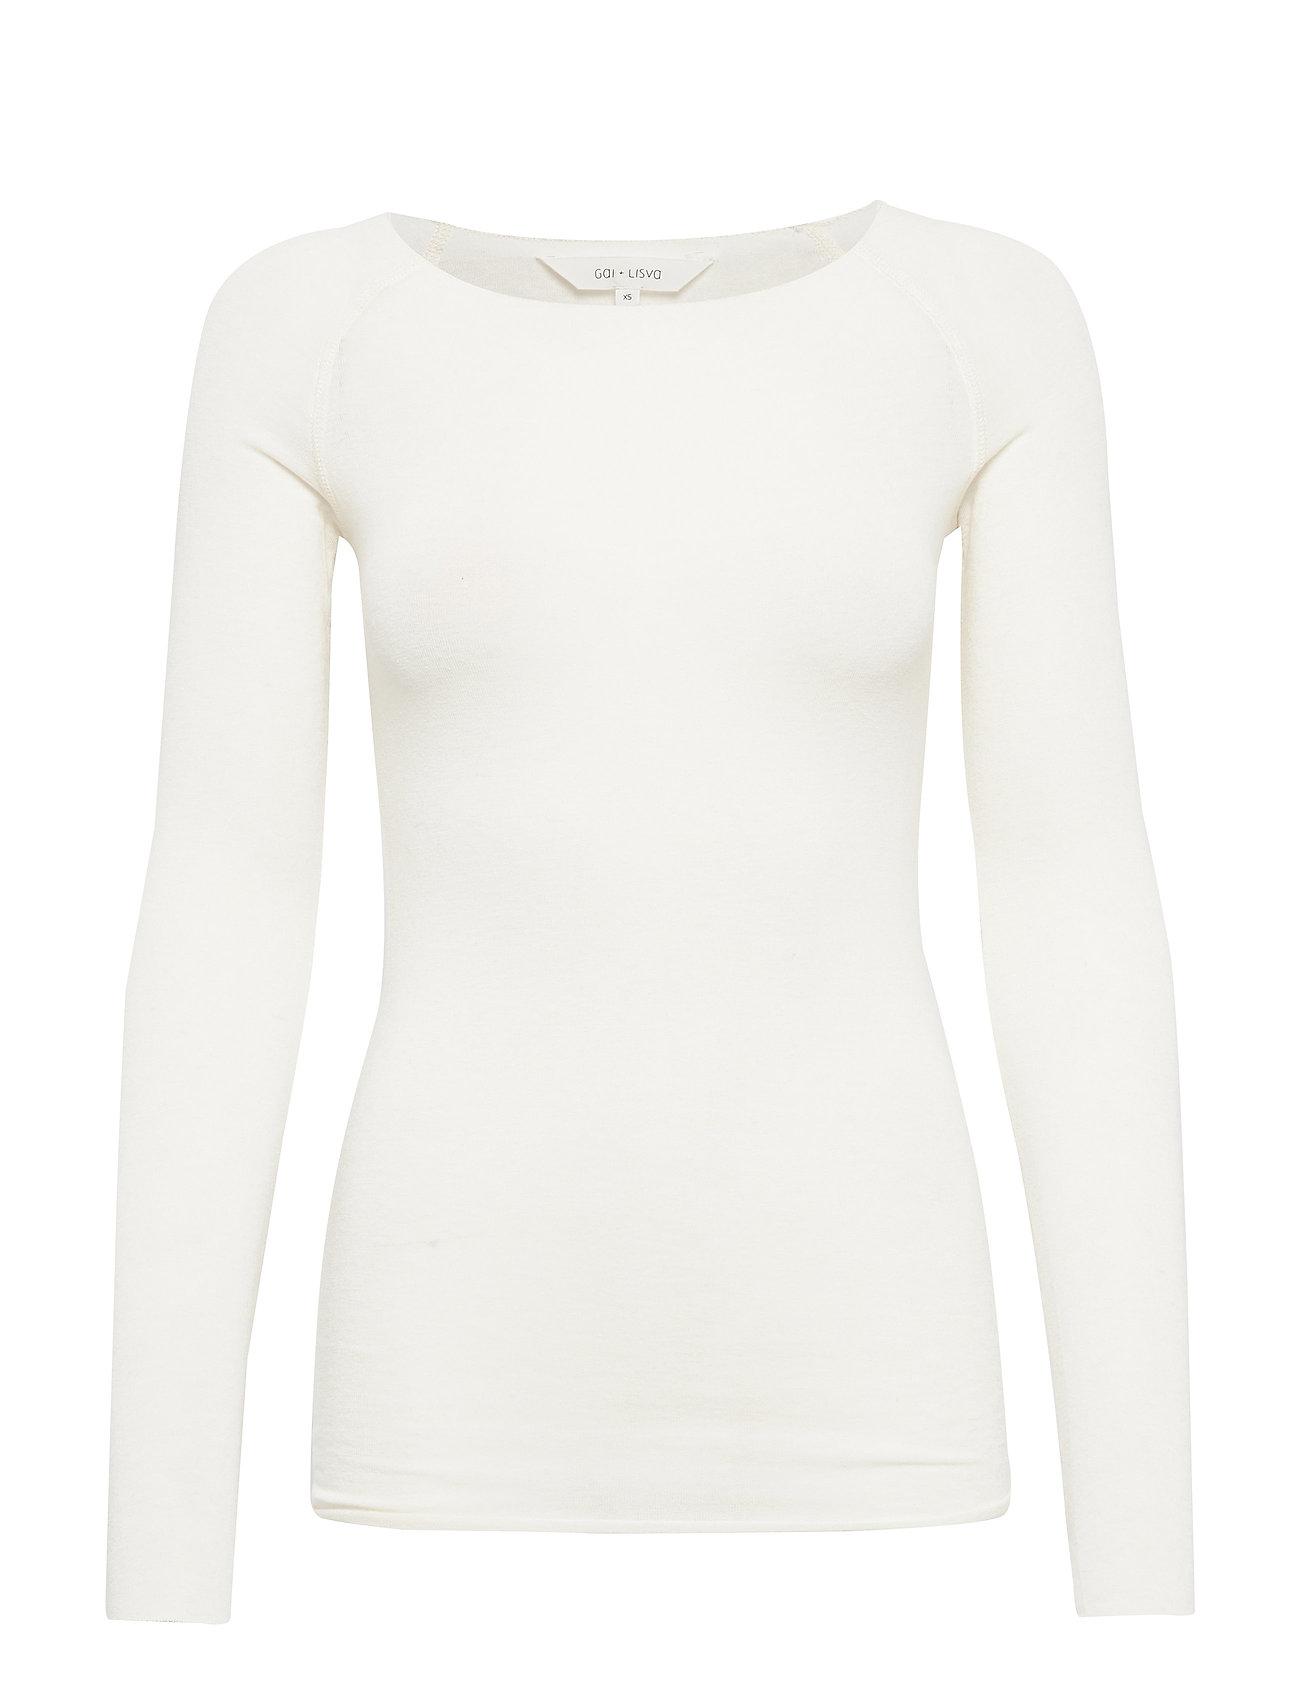 Gai+Lisva Amalie Solid - OFF WHITE